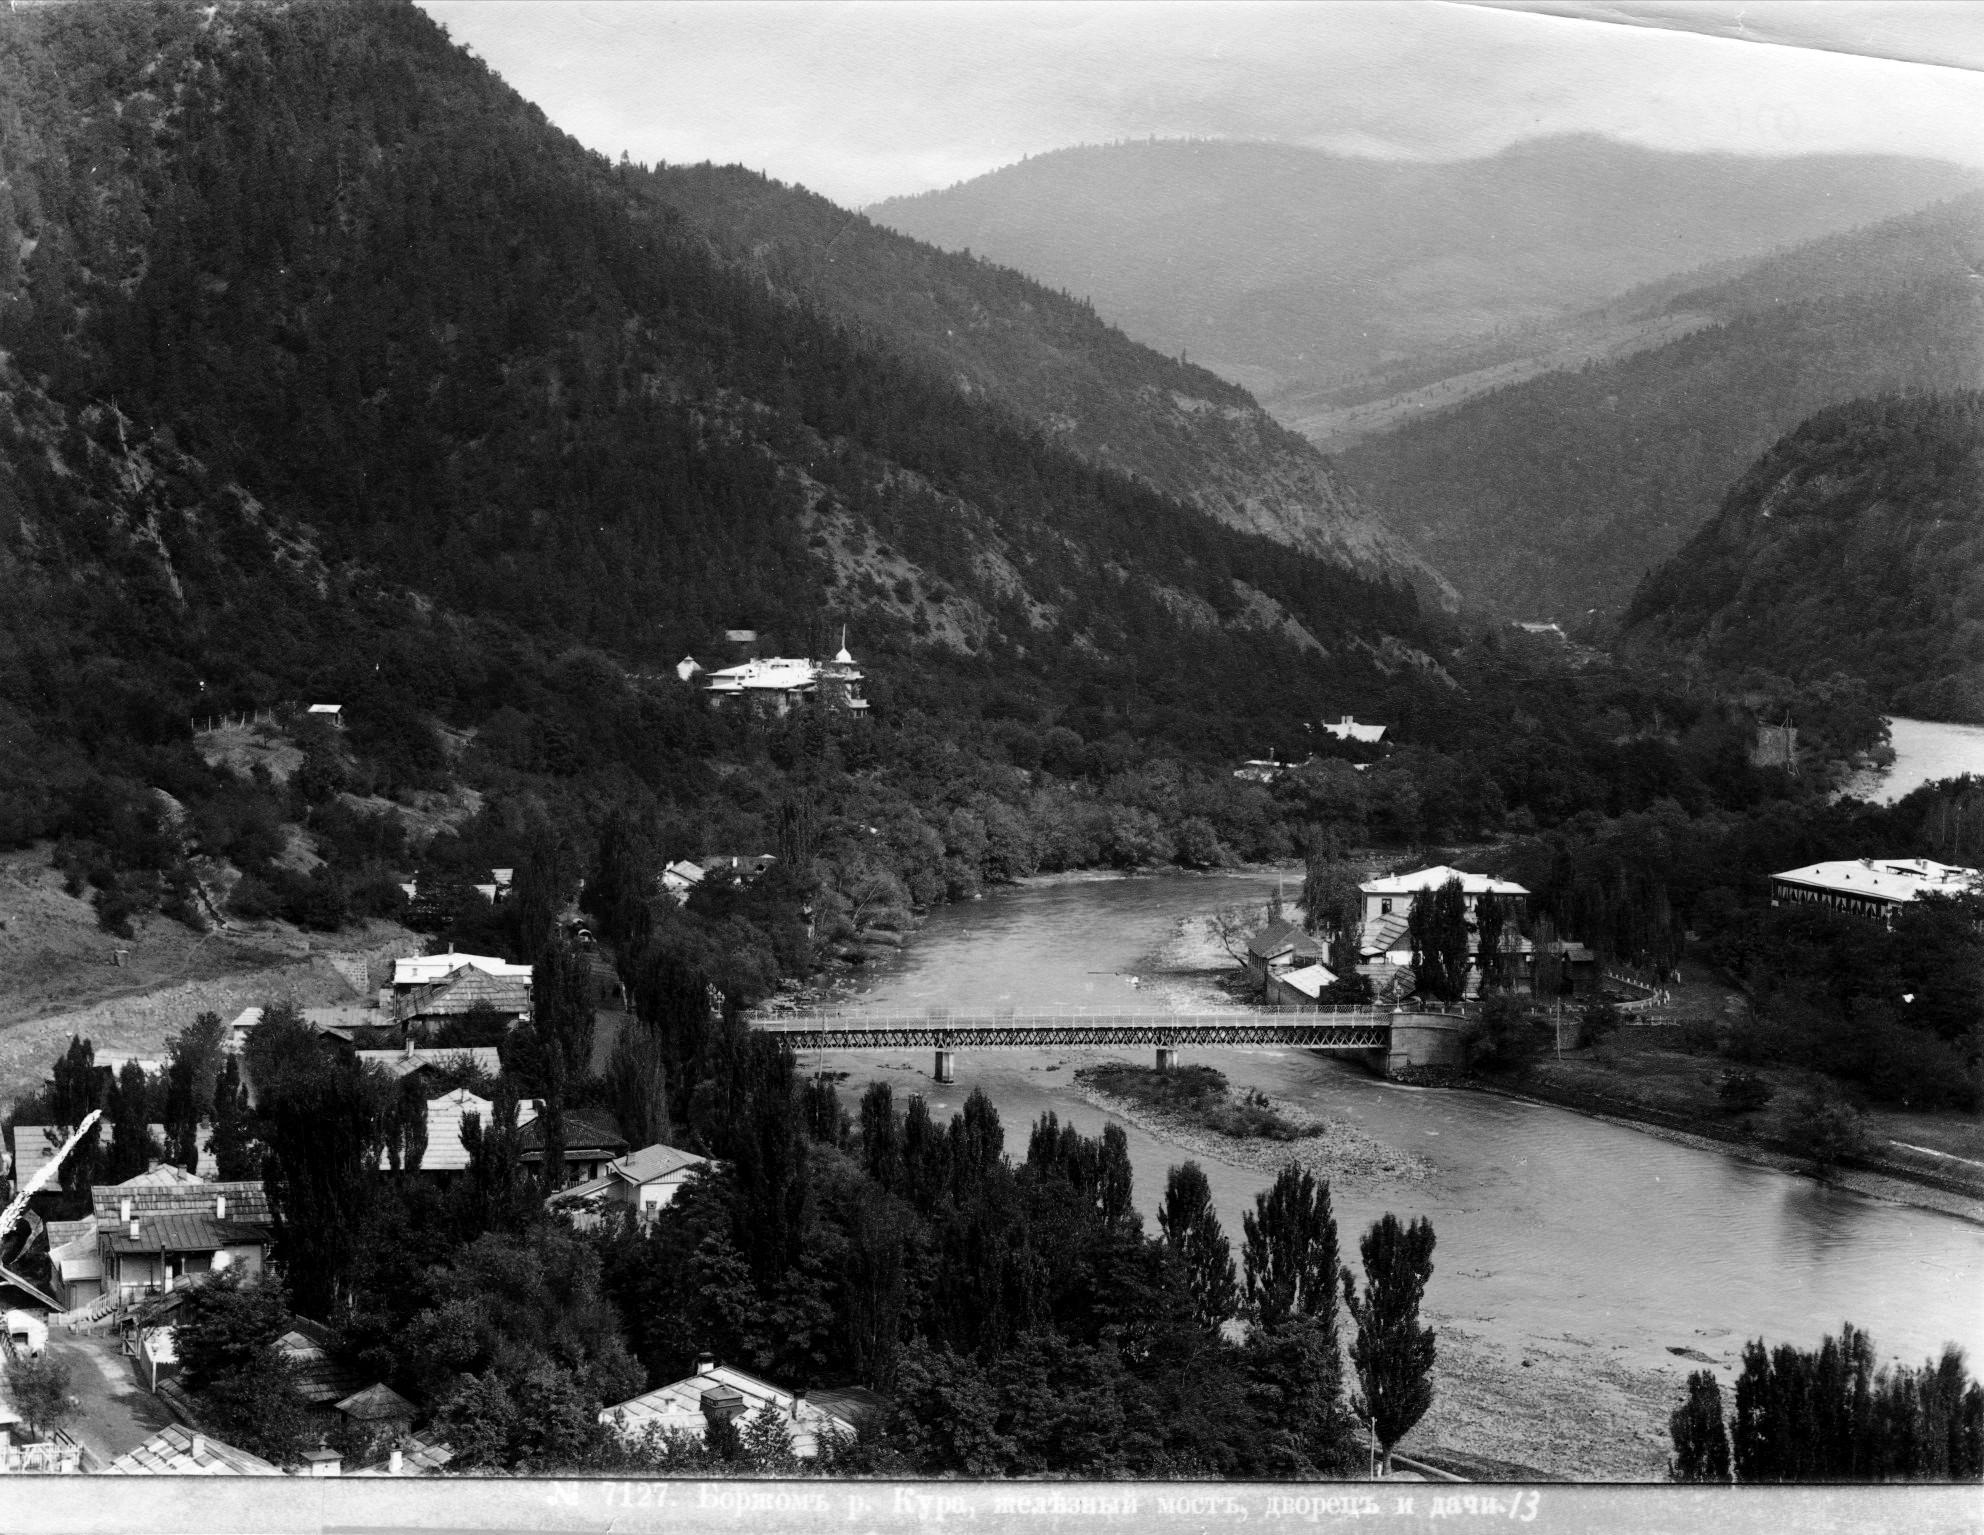 Река Кура, Железный мост, Дворец и дачи